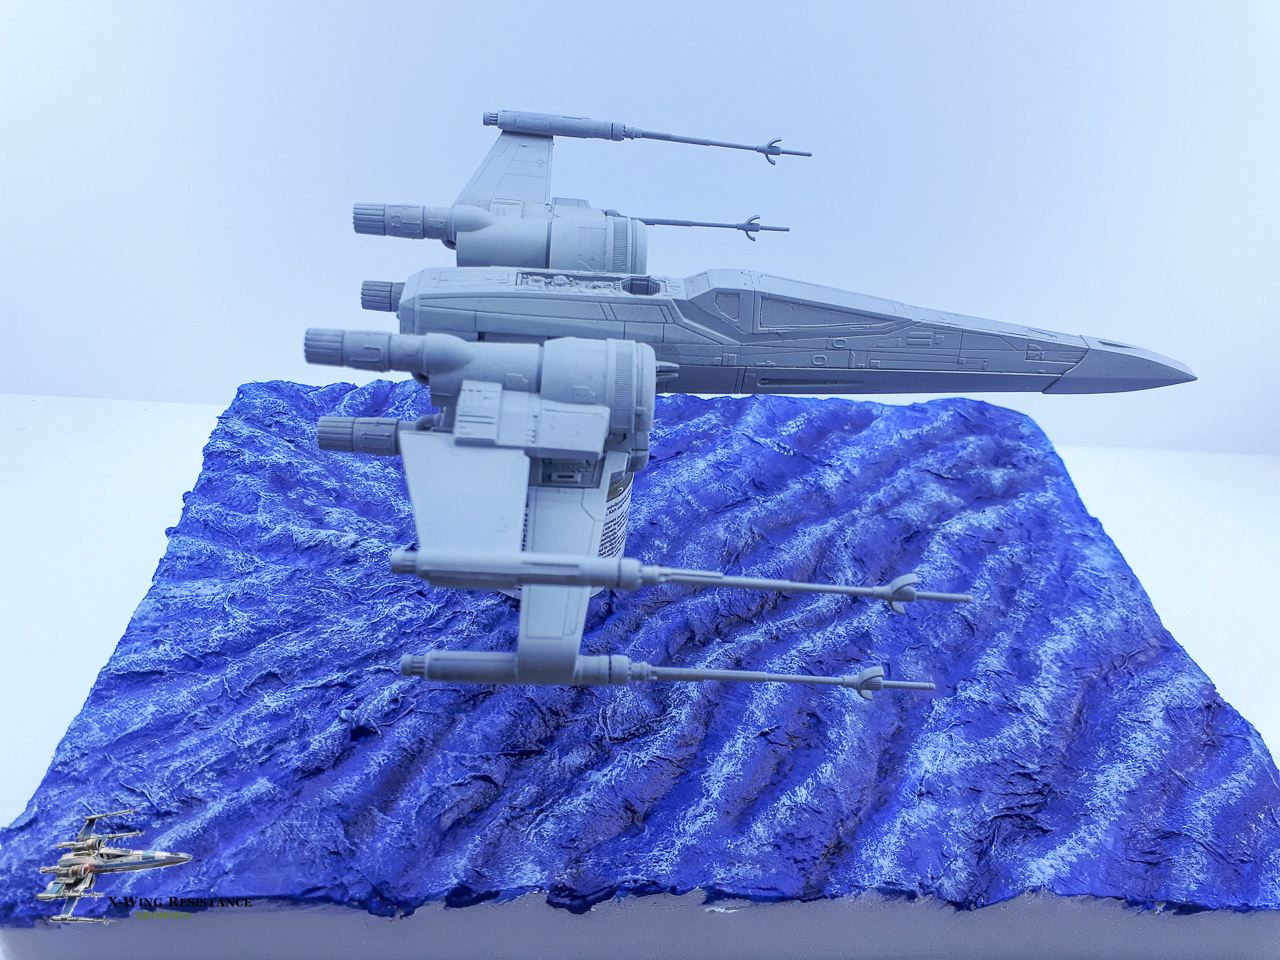 X-wing résistance - Bandai 1/72eme 2018-032